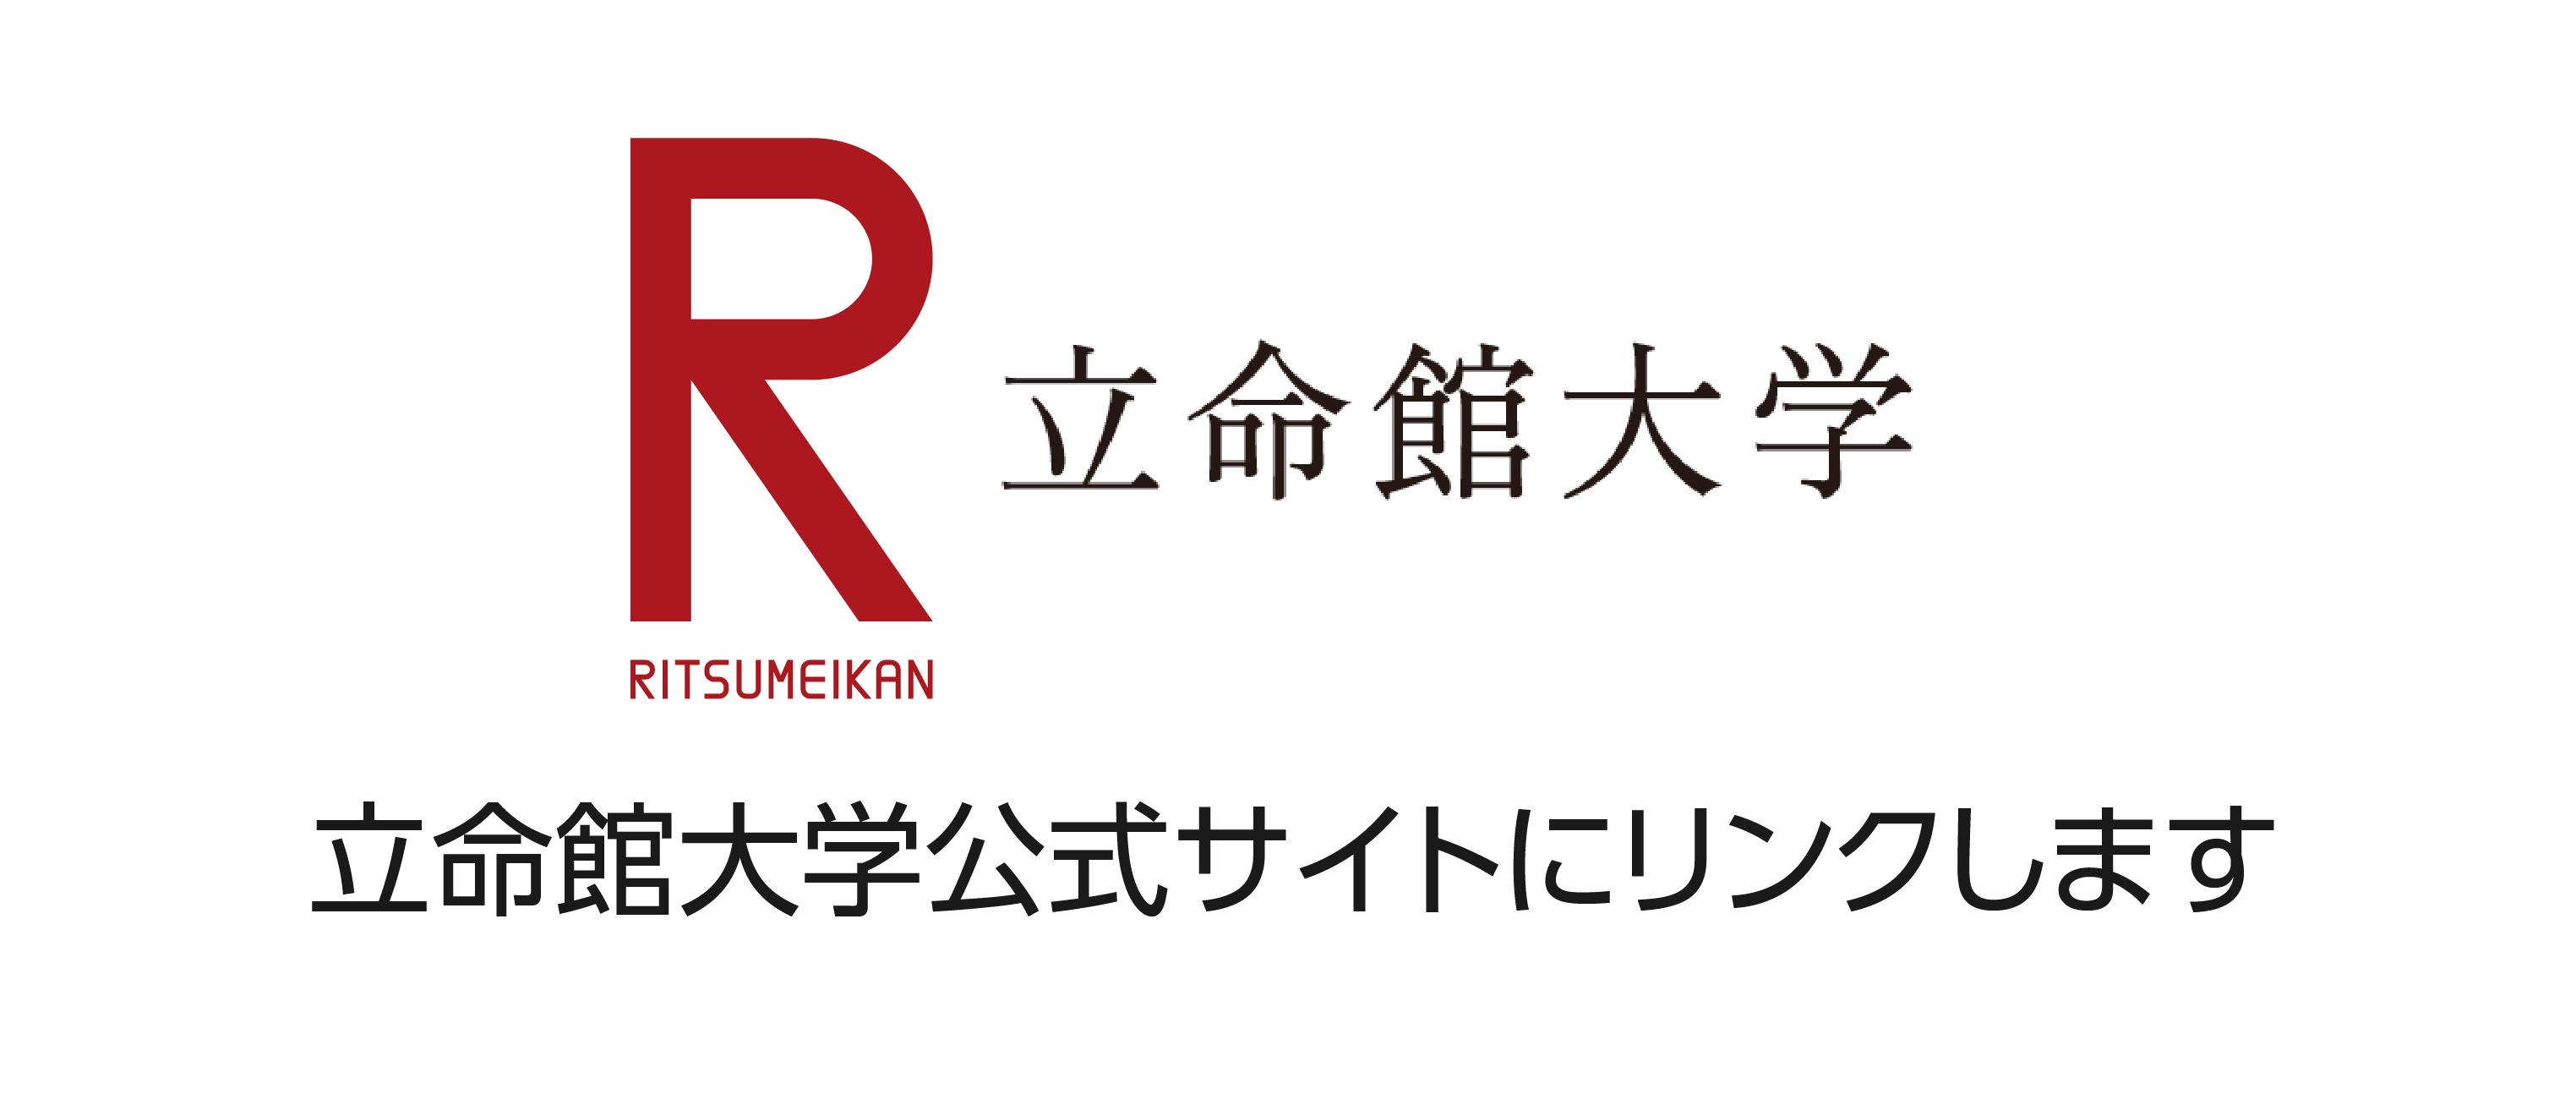 工業 manaba 福井 大学